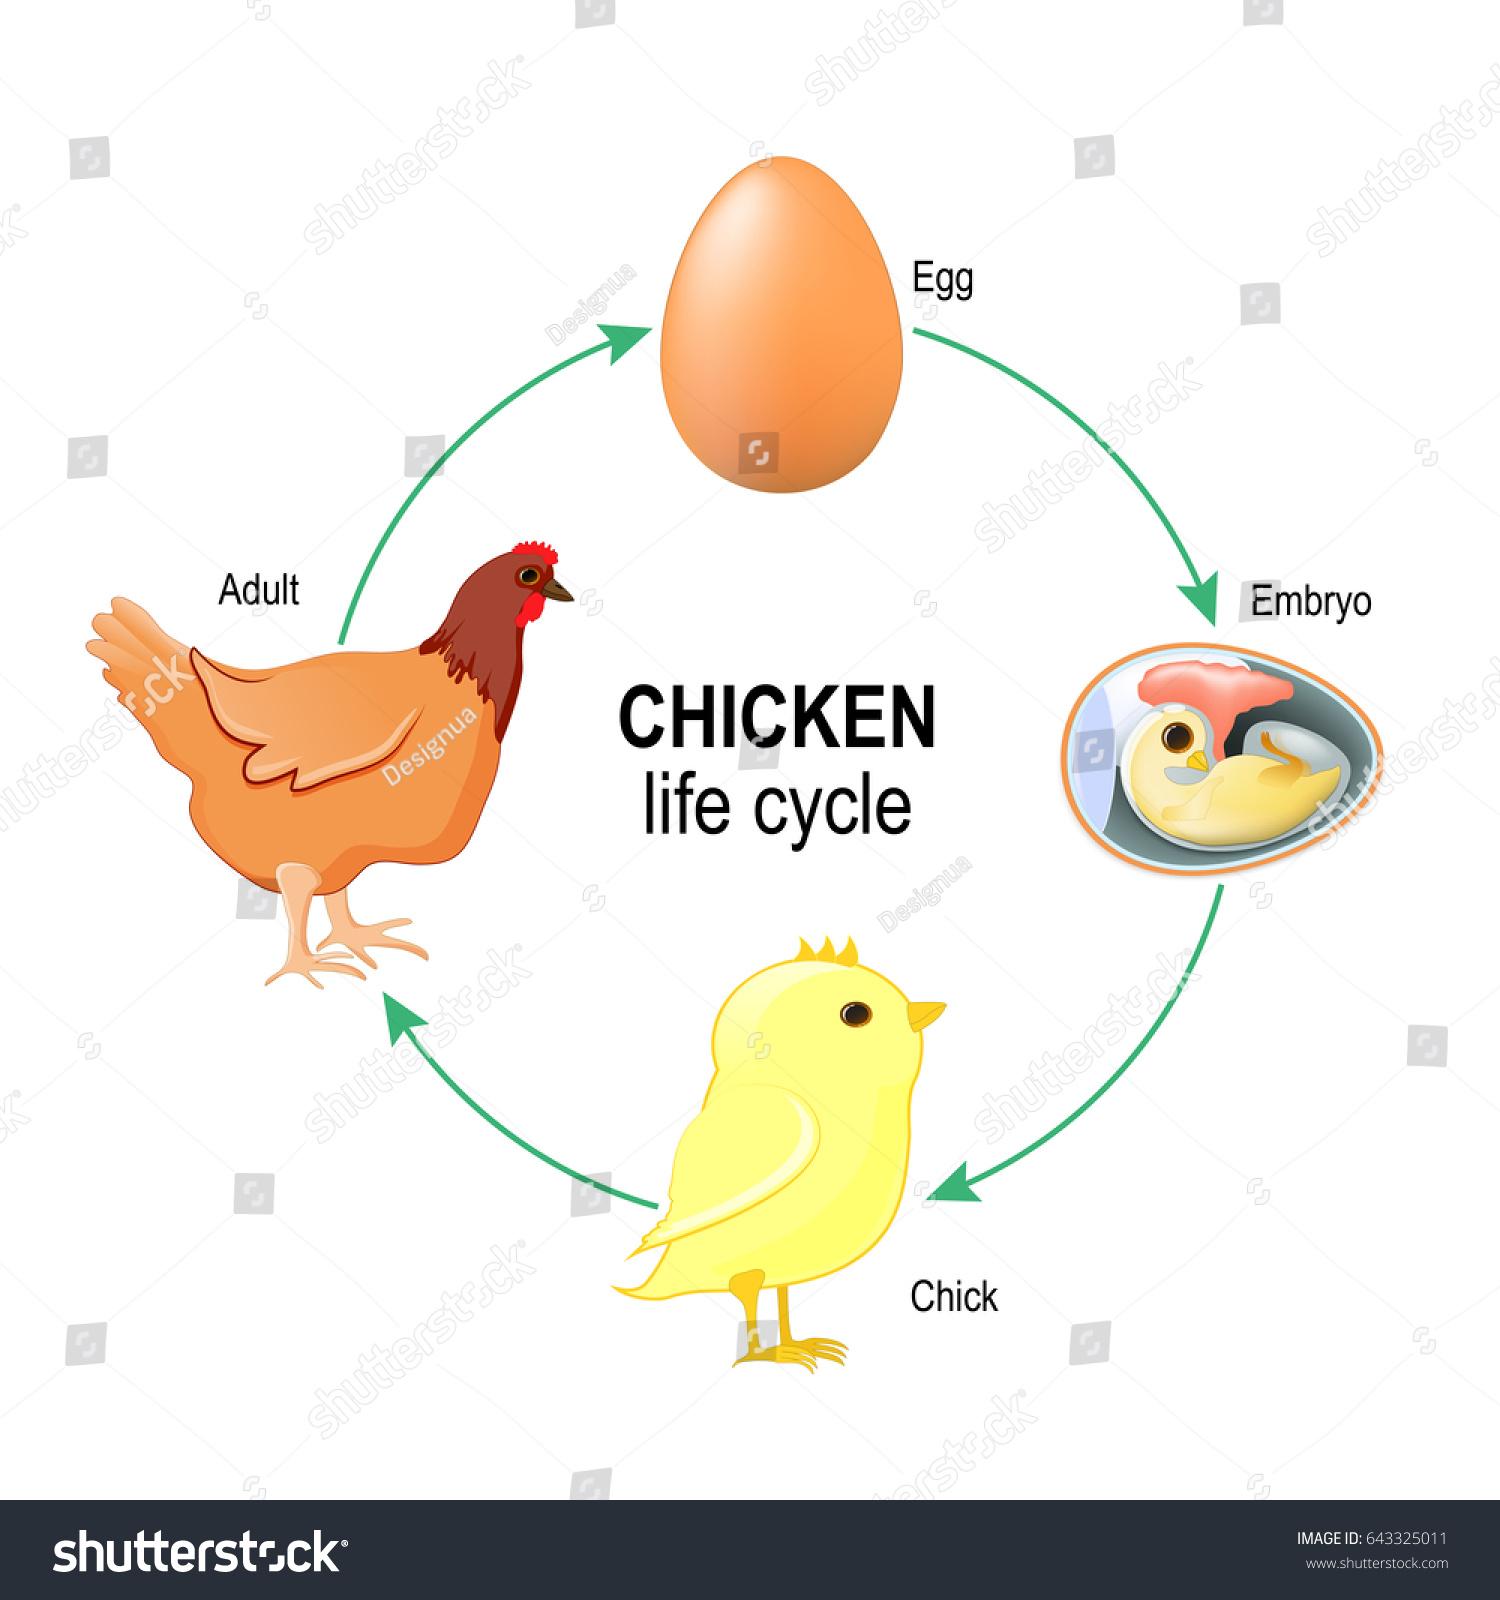 Anatomy of a chicken egg - global-brain-sounds.info